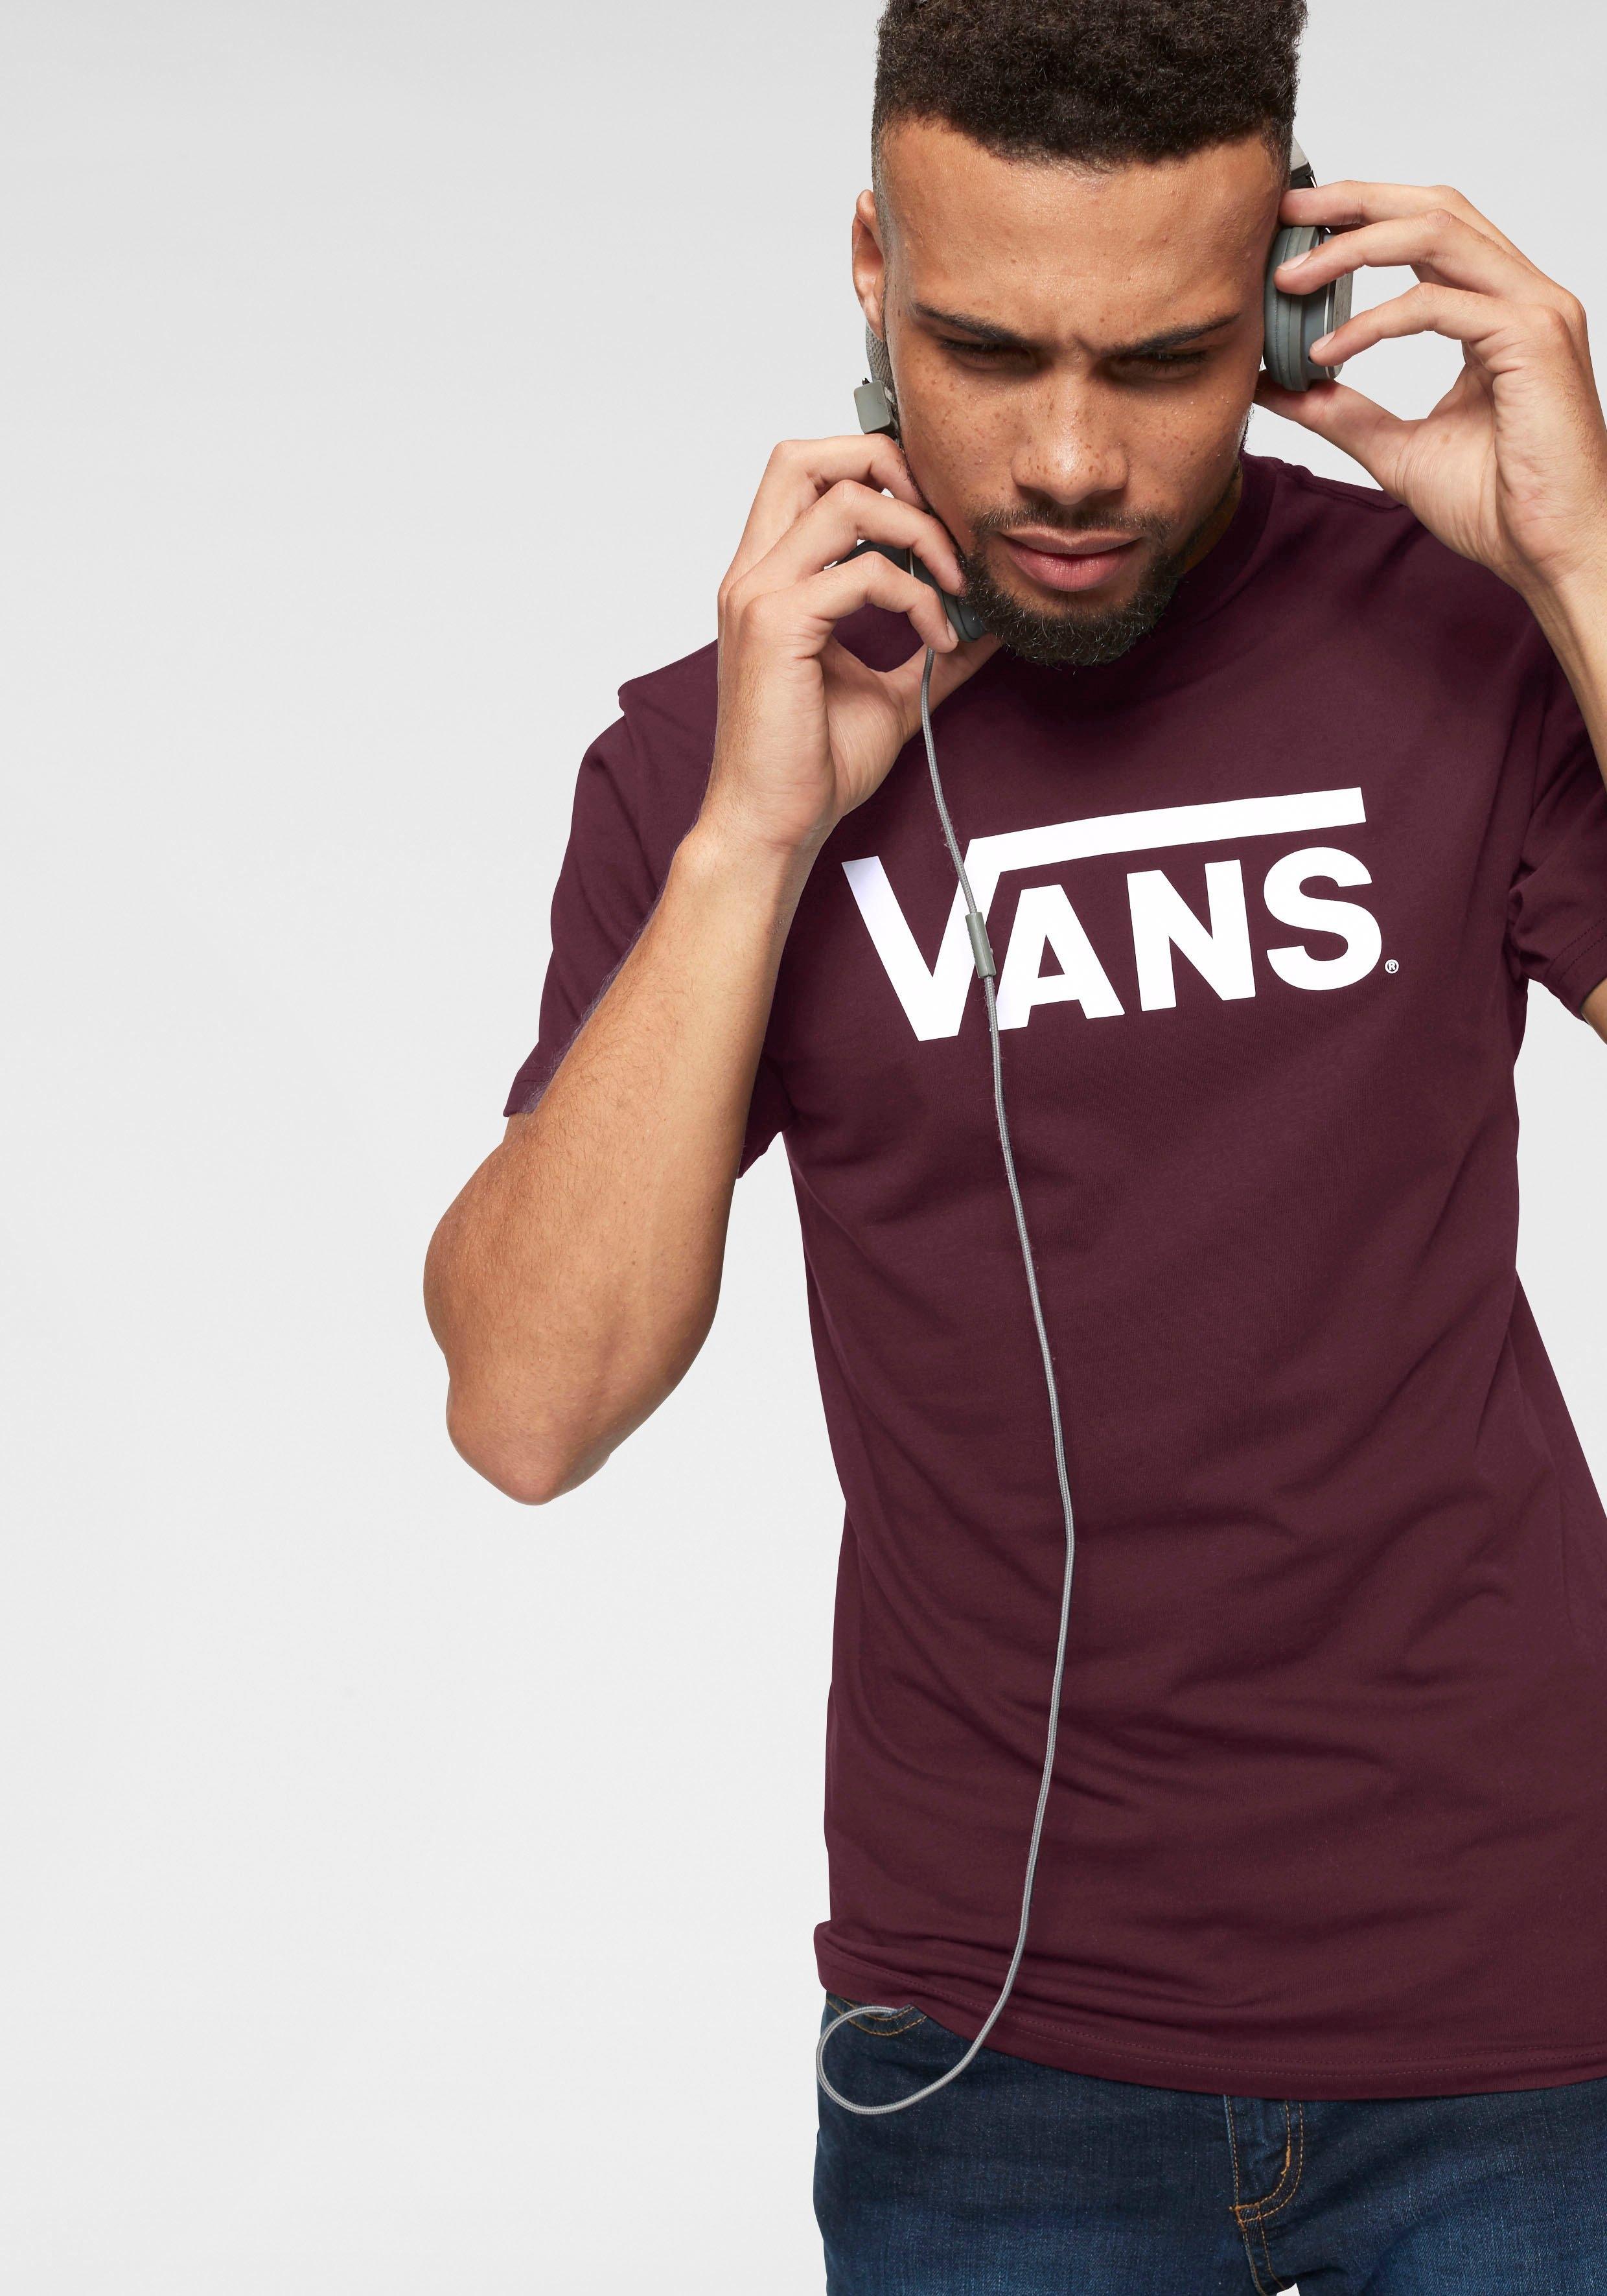 Vans T-shirt SP19 M CORE APPAREL nu online bestellen